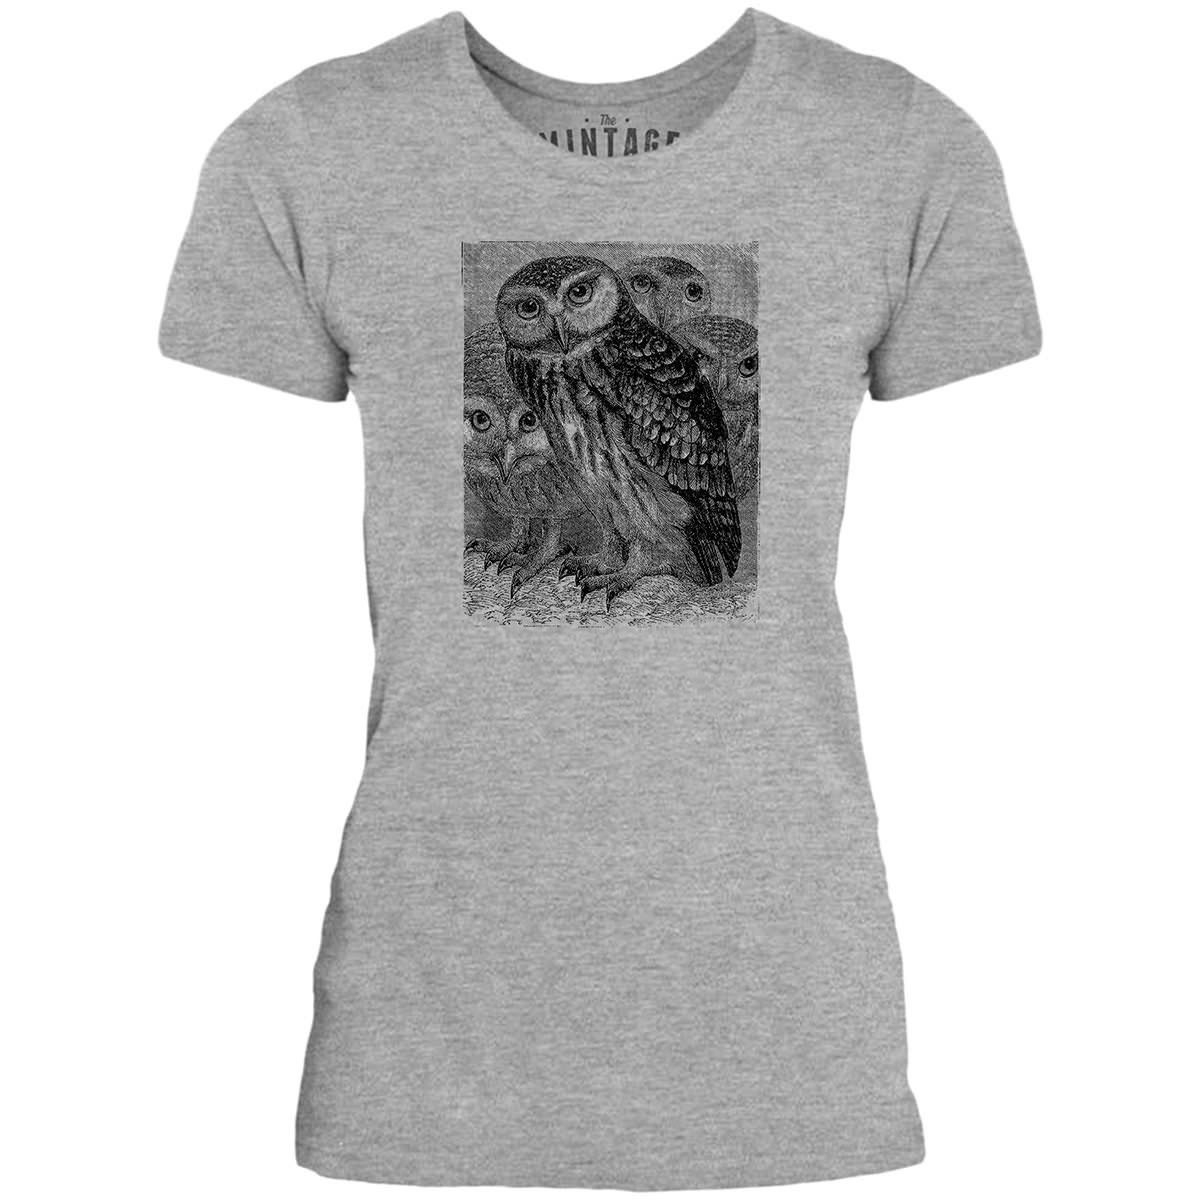 Mintage Barn Owls Womens Fine Jersey T-Shirt